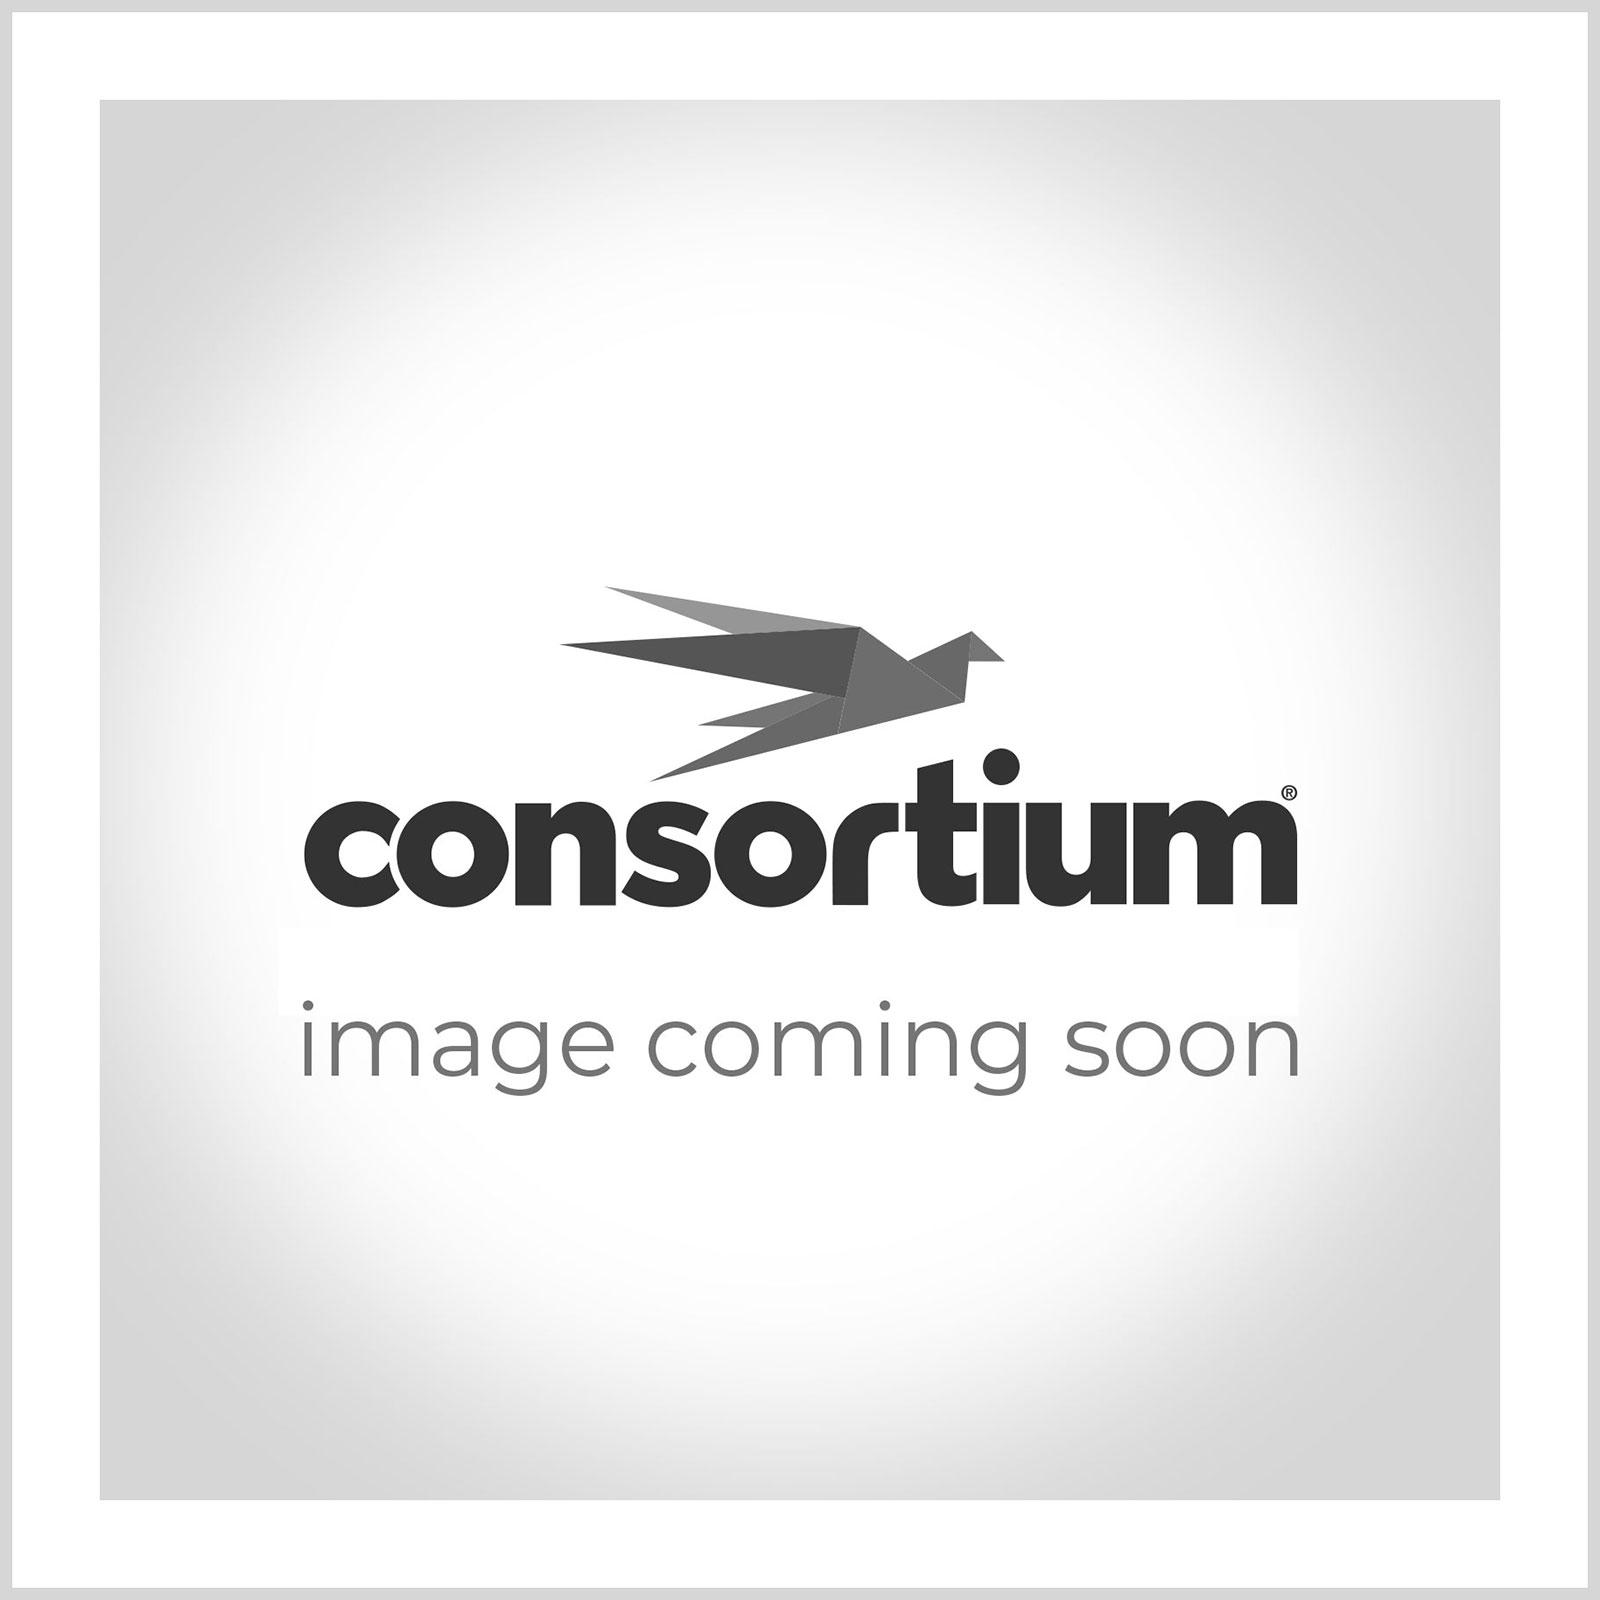 Crazy Cut Scissors